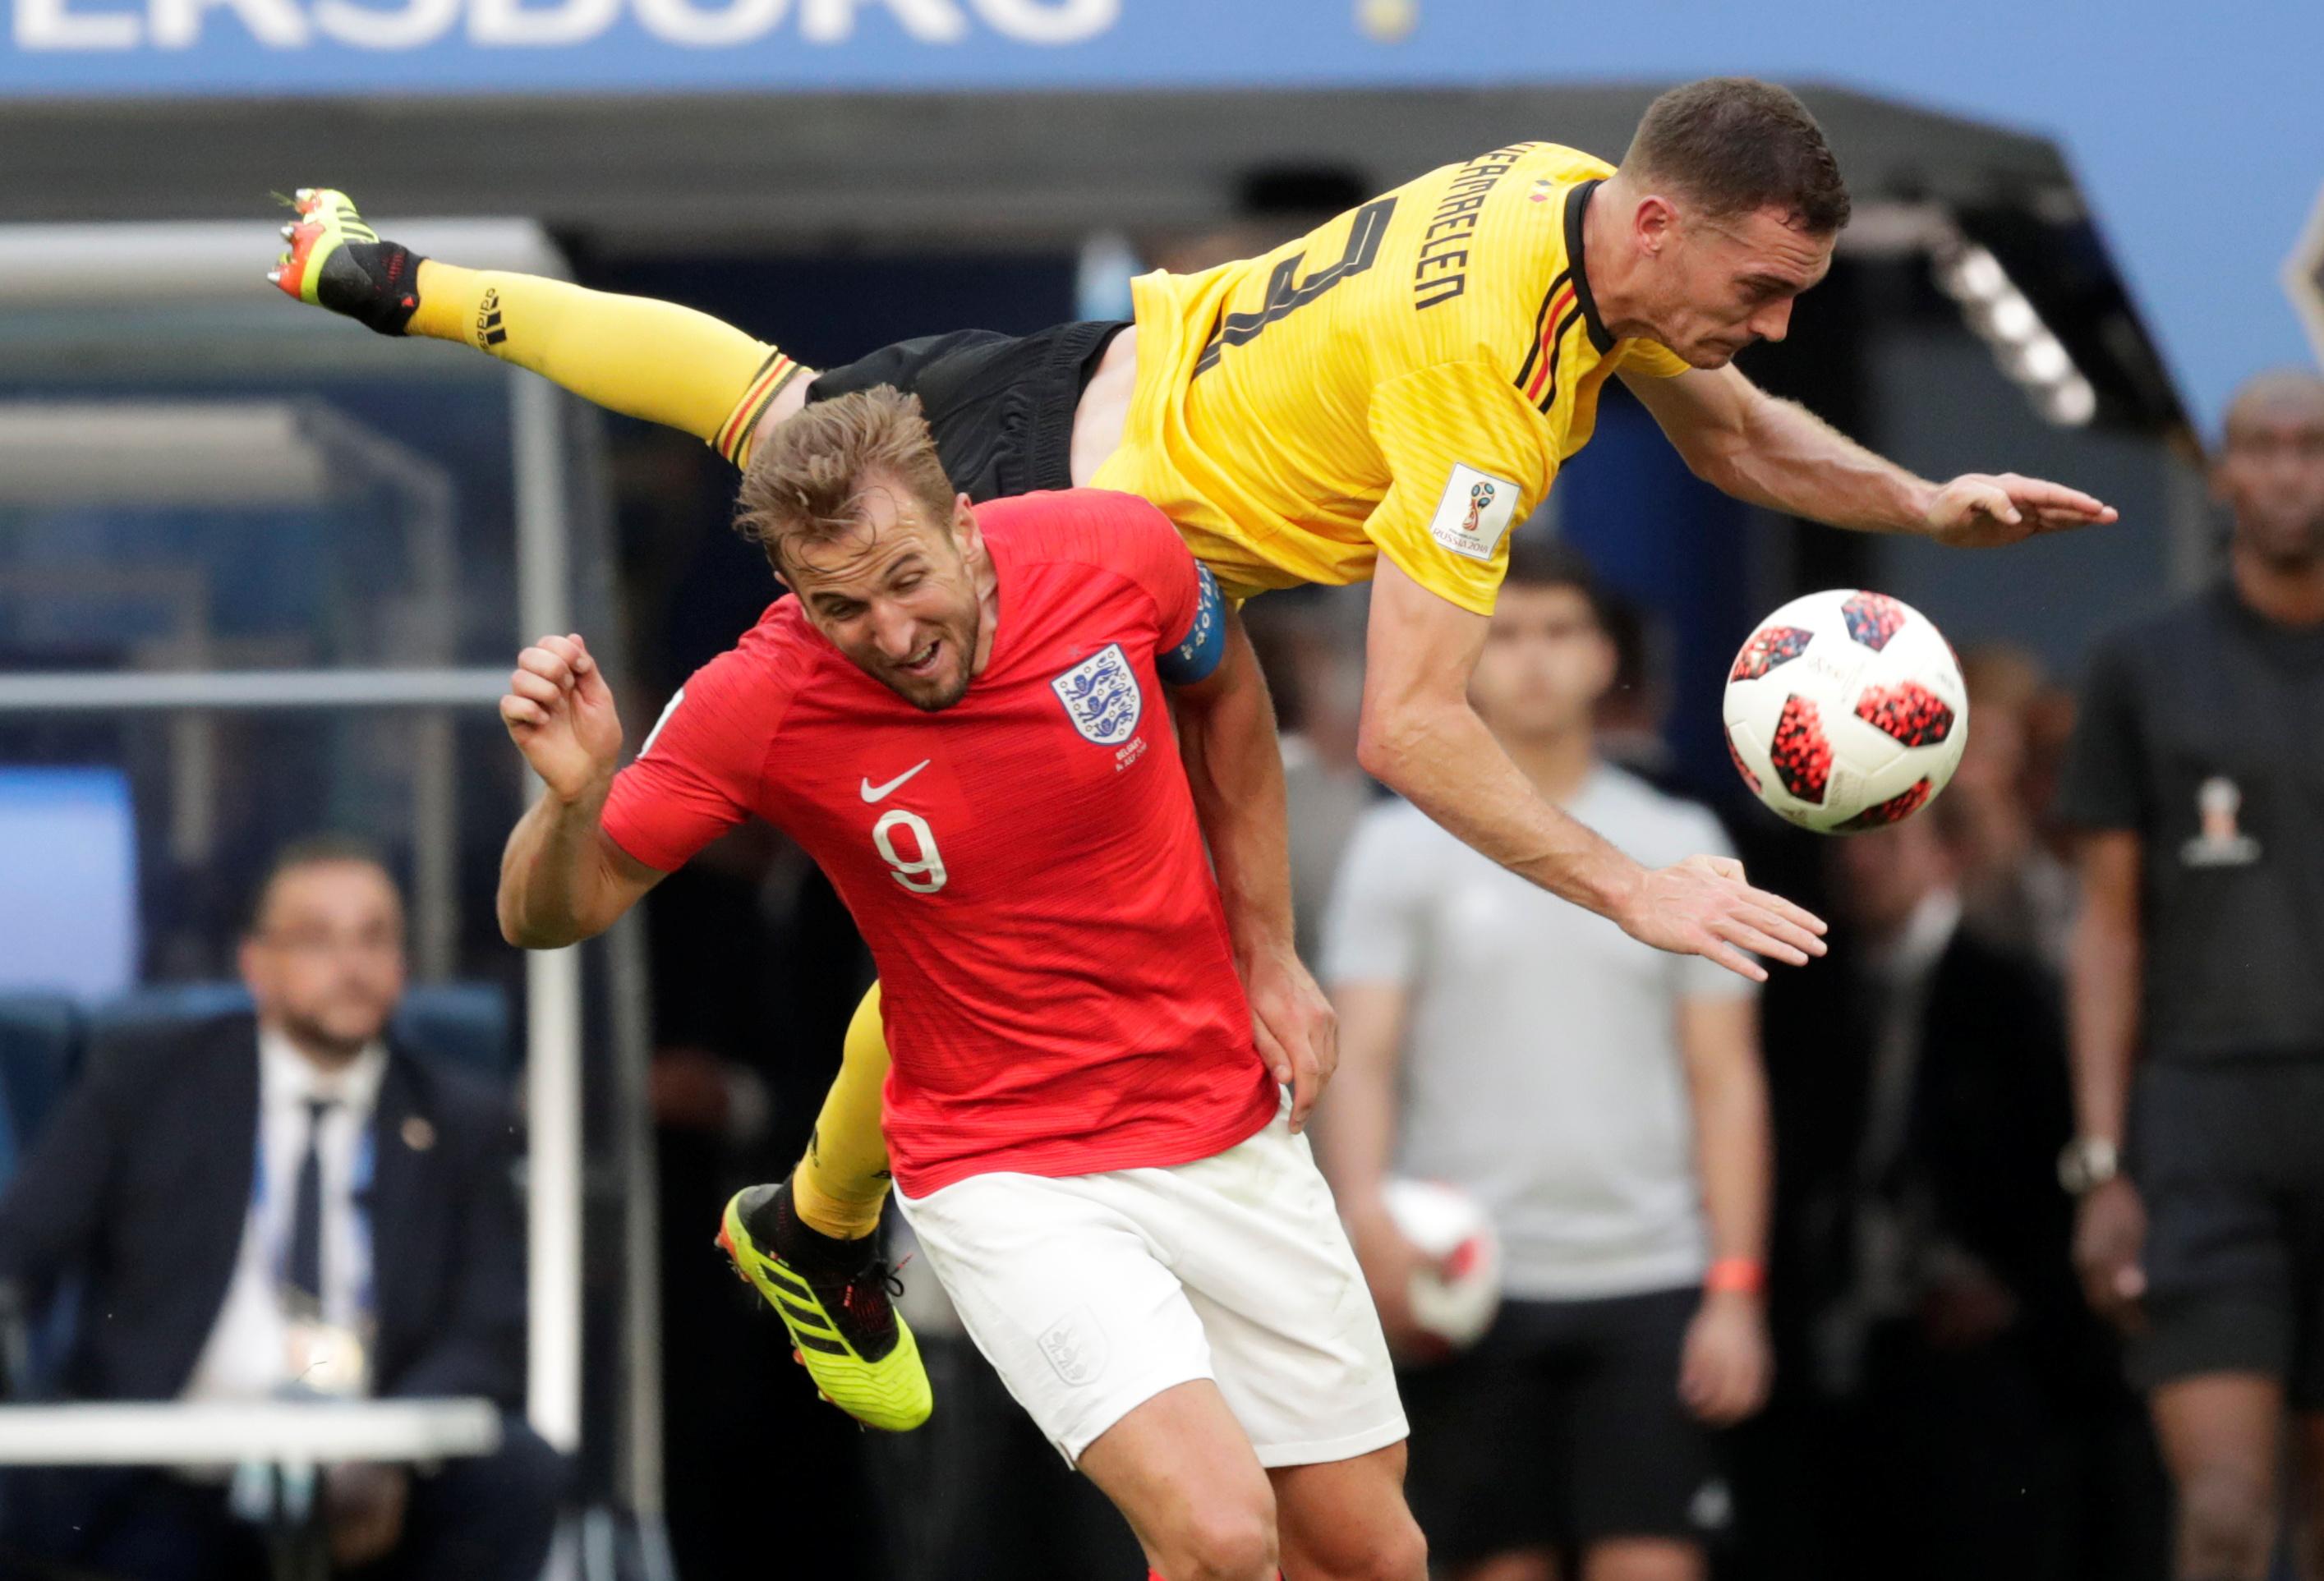 Bélgica logra tercer lugar tras derrotar a Inglaterra